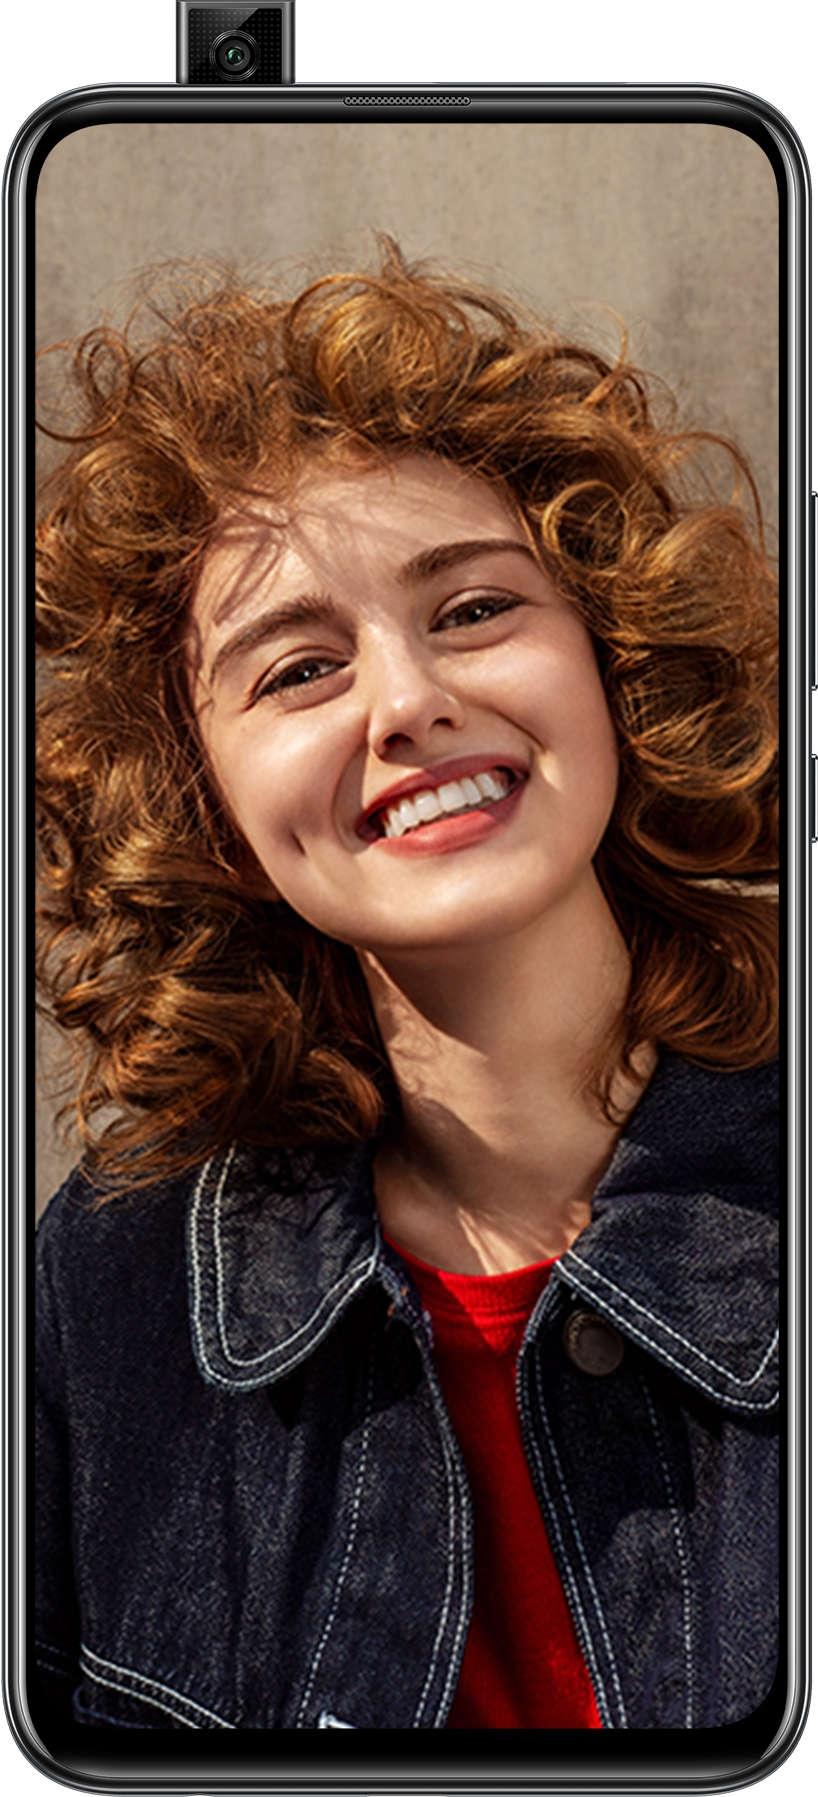 huawei y9 prime 2019 ai selfie caméra frontale